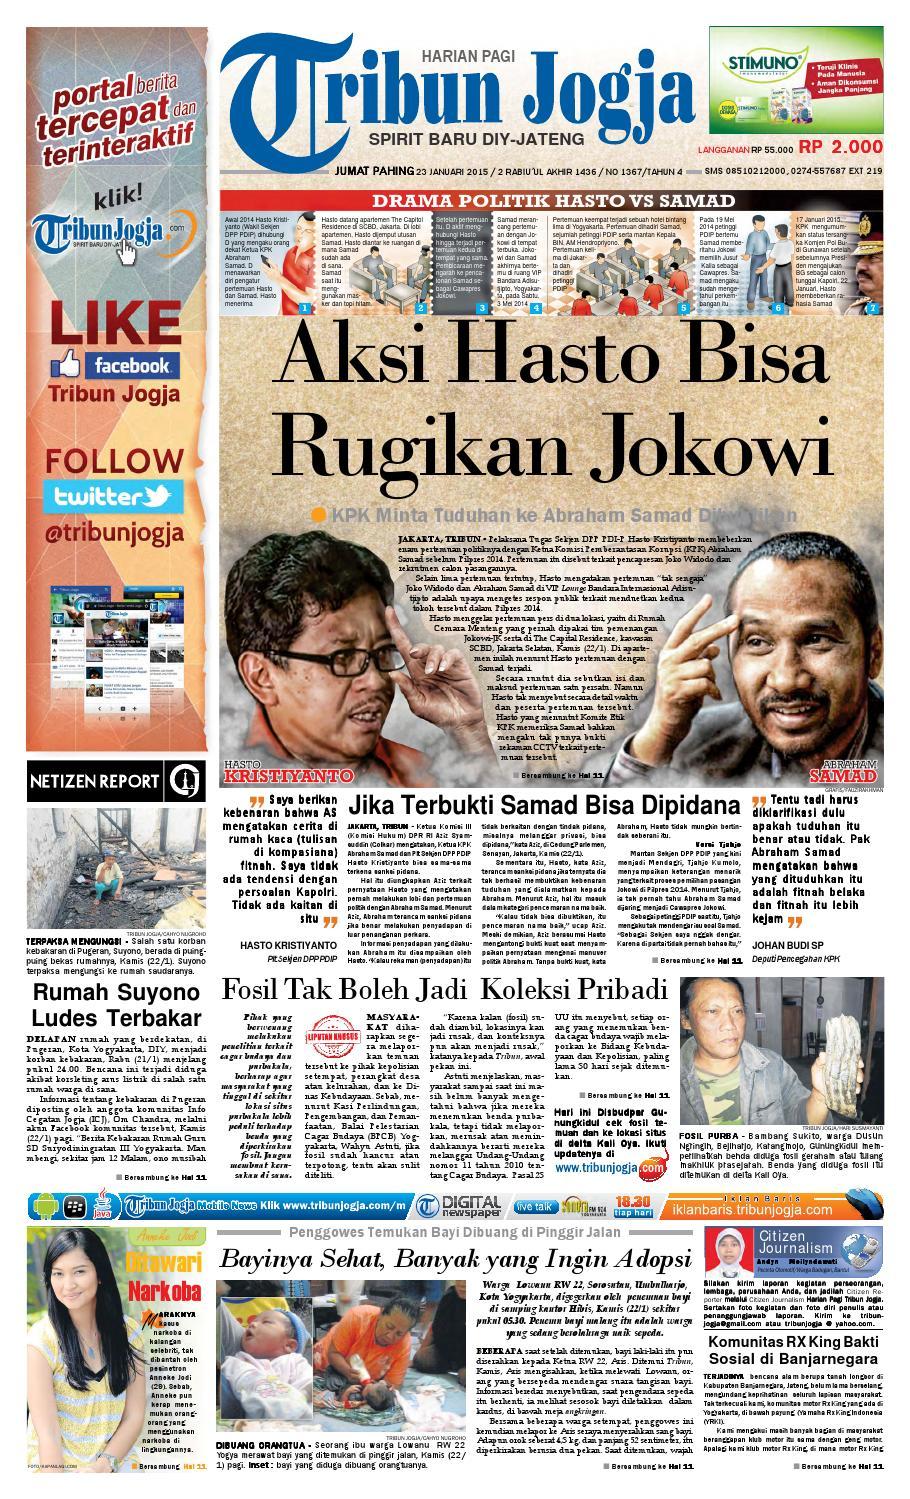 Tribunjogja 23 01 2015 By Tribun Jogja Issuu Produk Ukm Bumn Jus Durian Lite Kuning Omah Duren